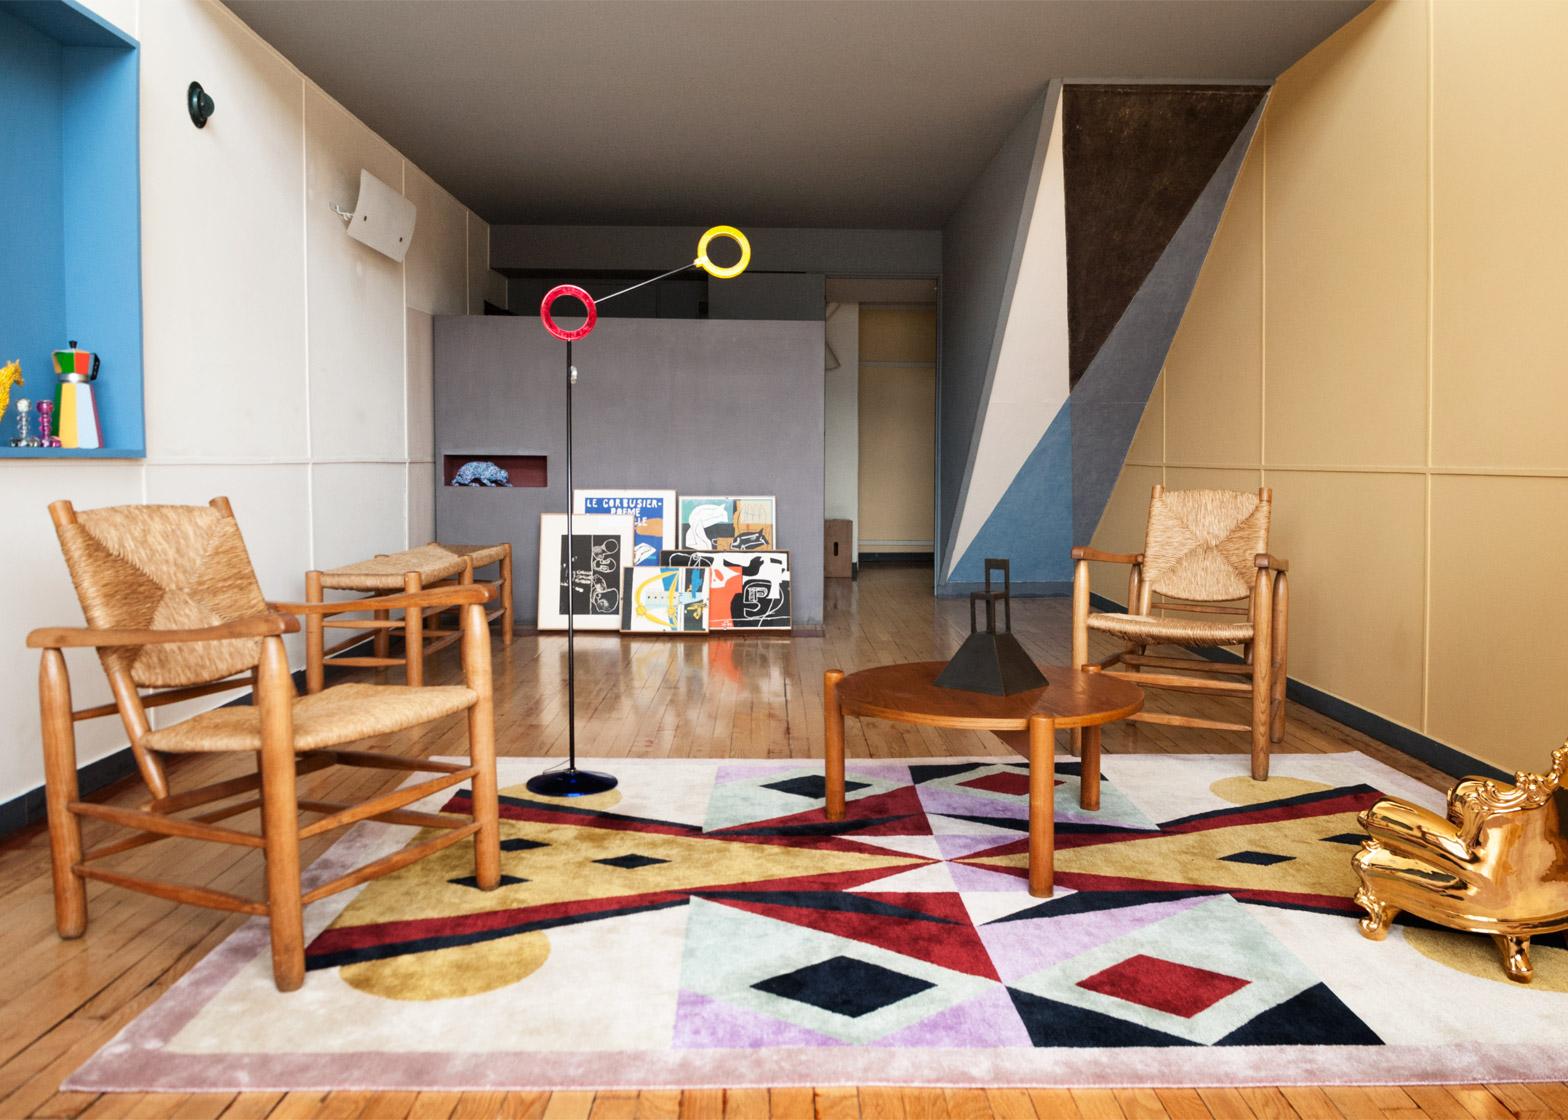 appartement-50-alessandro-mendini-cite-radieuse-corbusier_dezeen_1568_0